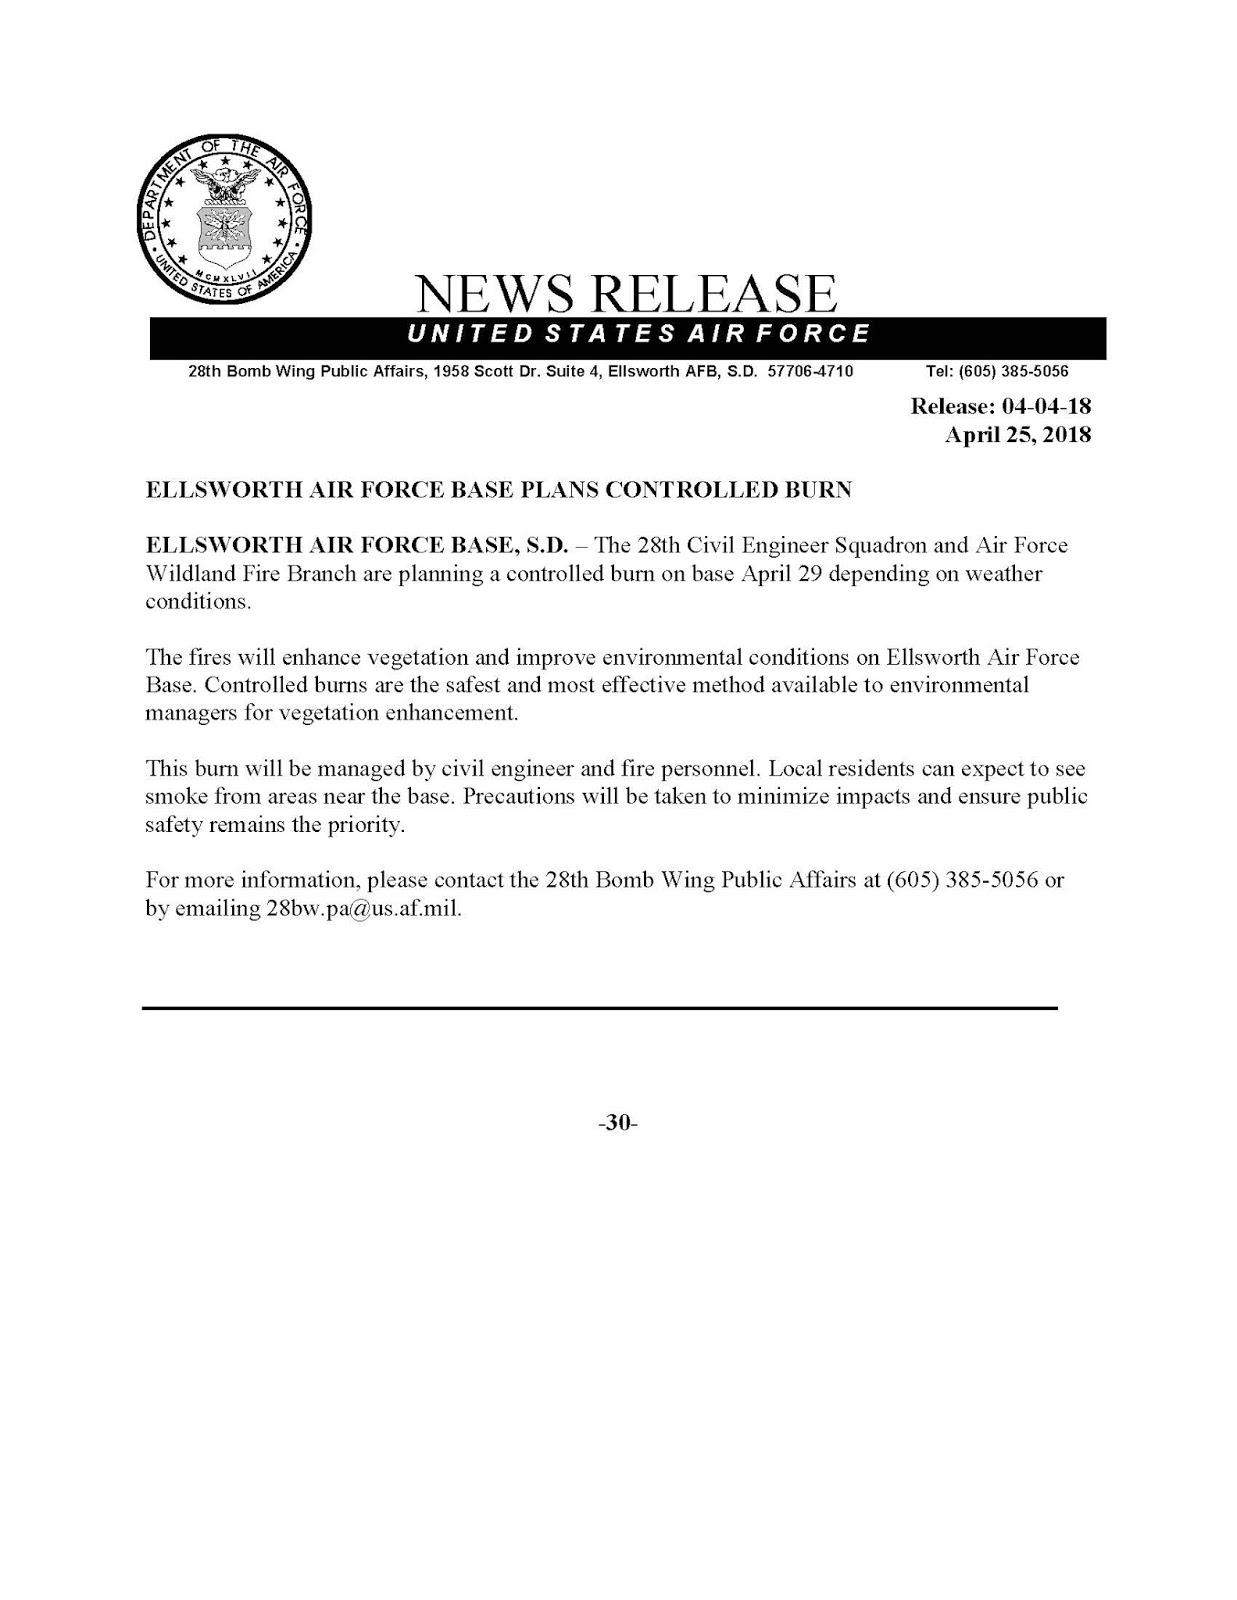 ellsworth air force base plans prescribed fire